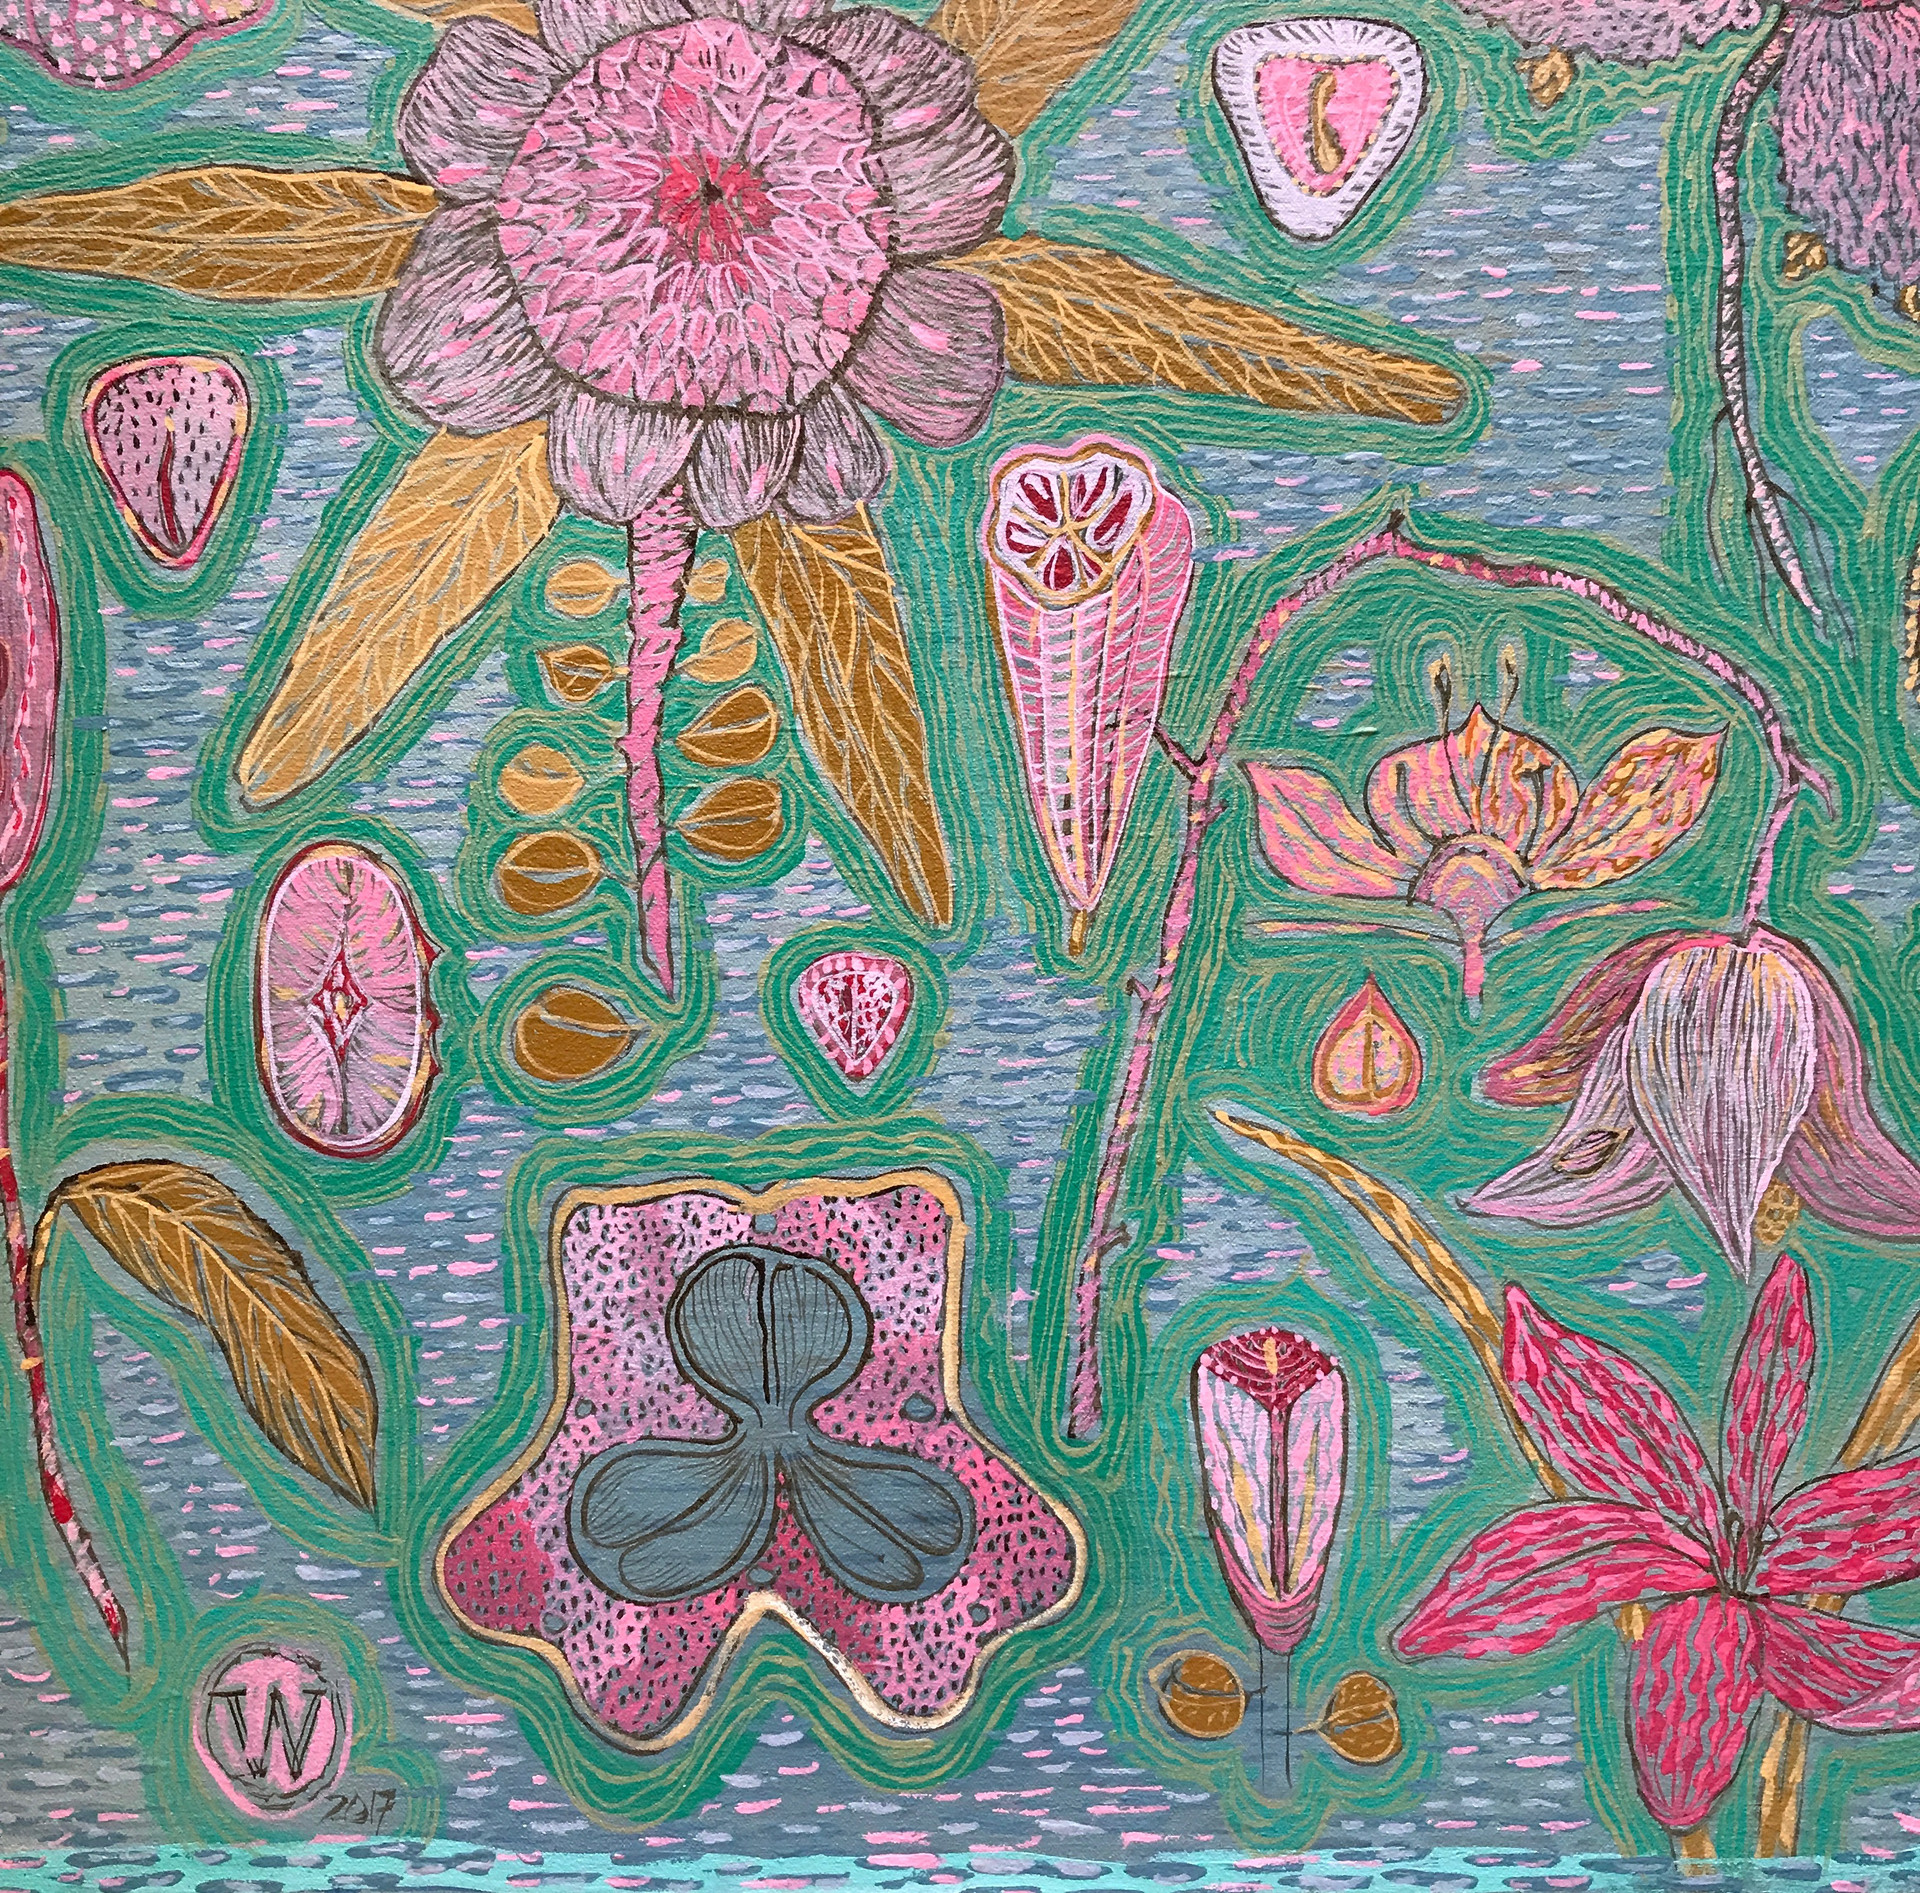 willemien de villiers | spring 2, detail |  POA